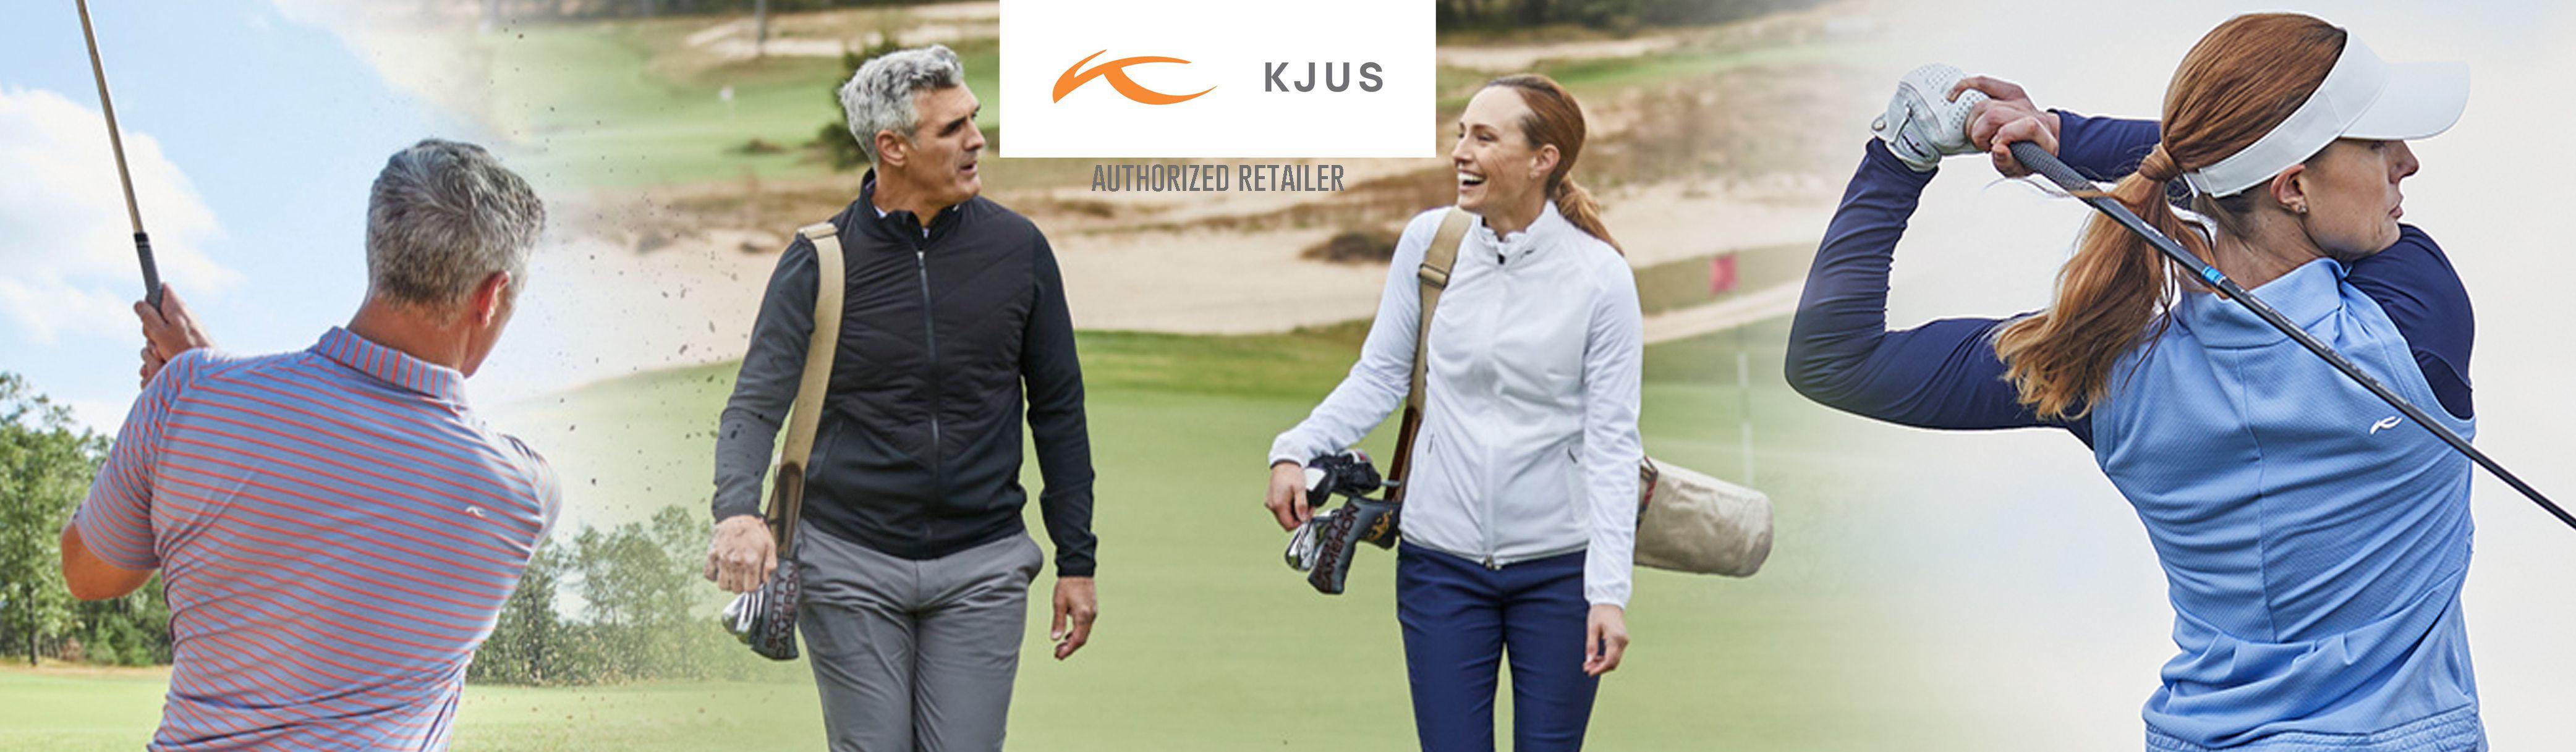 KJUS Golfkleding 2020